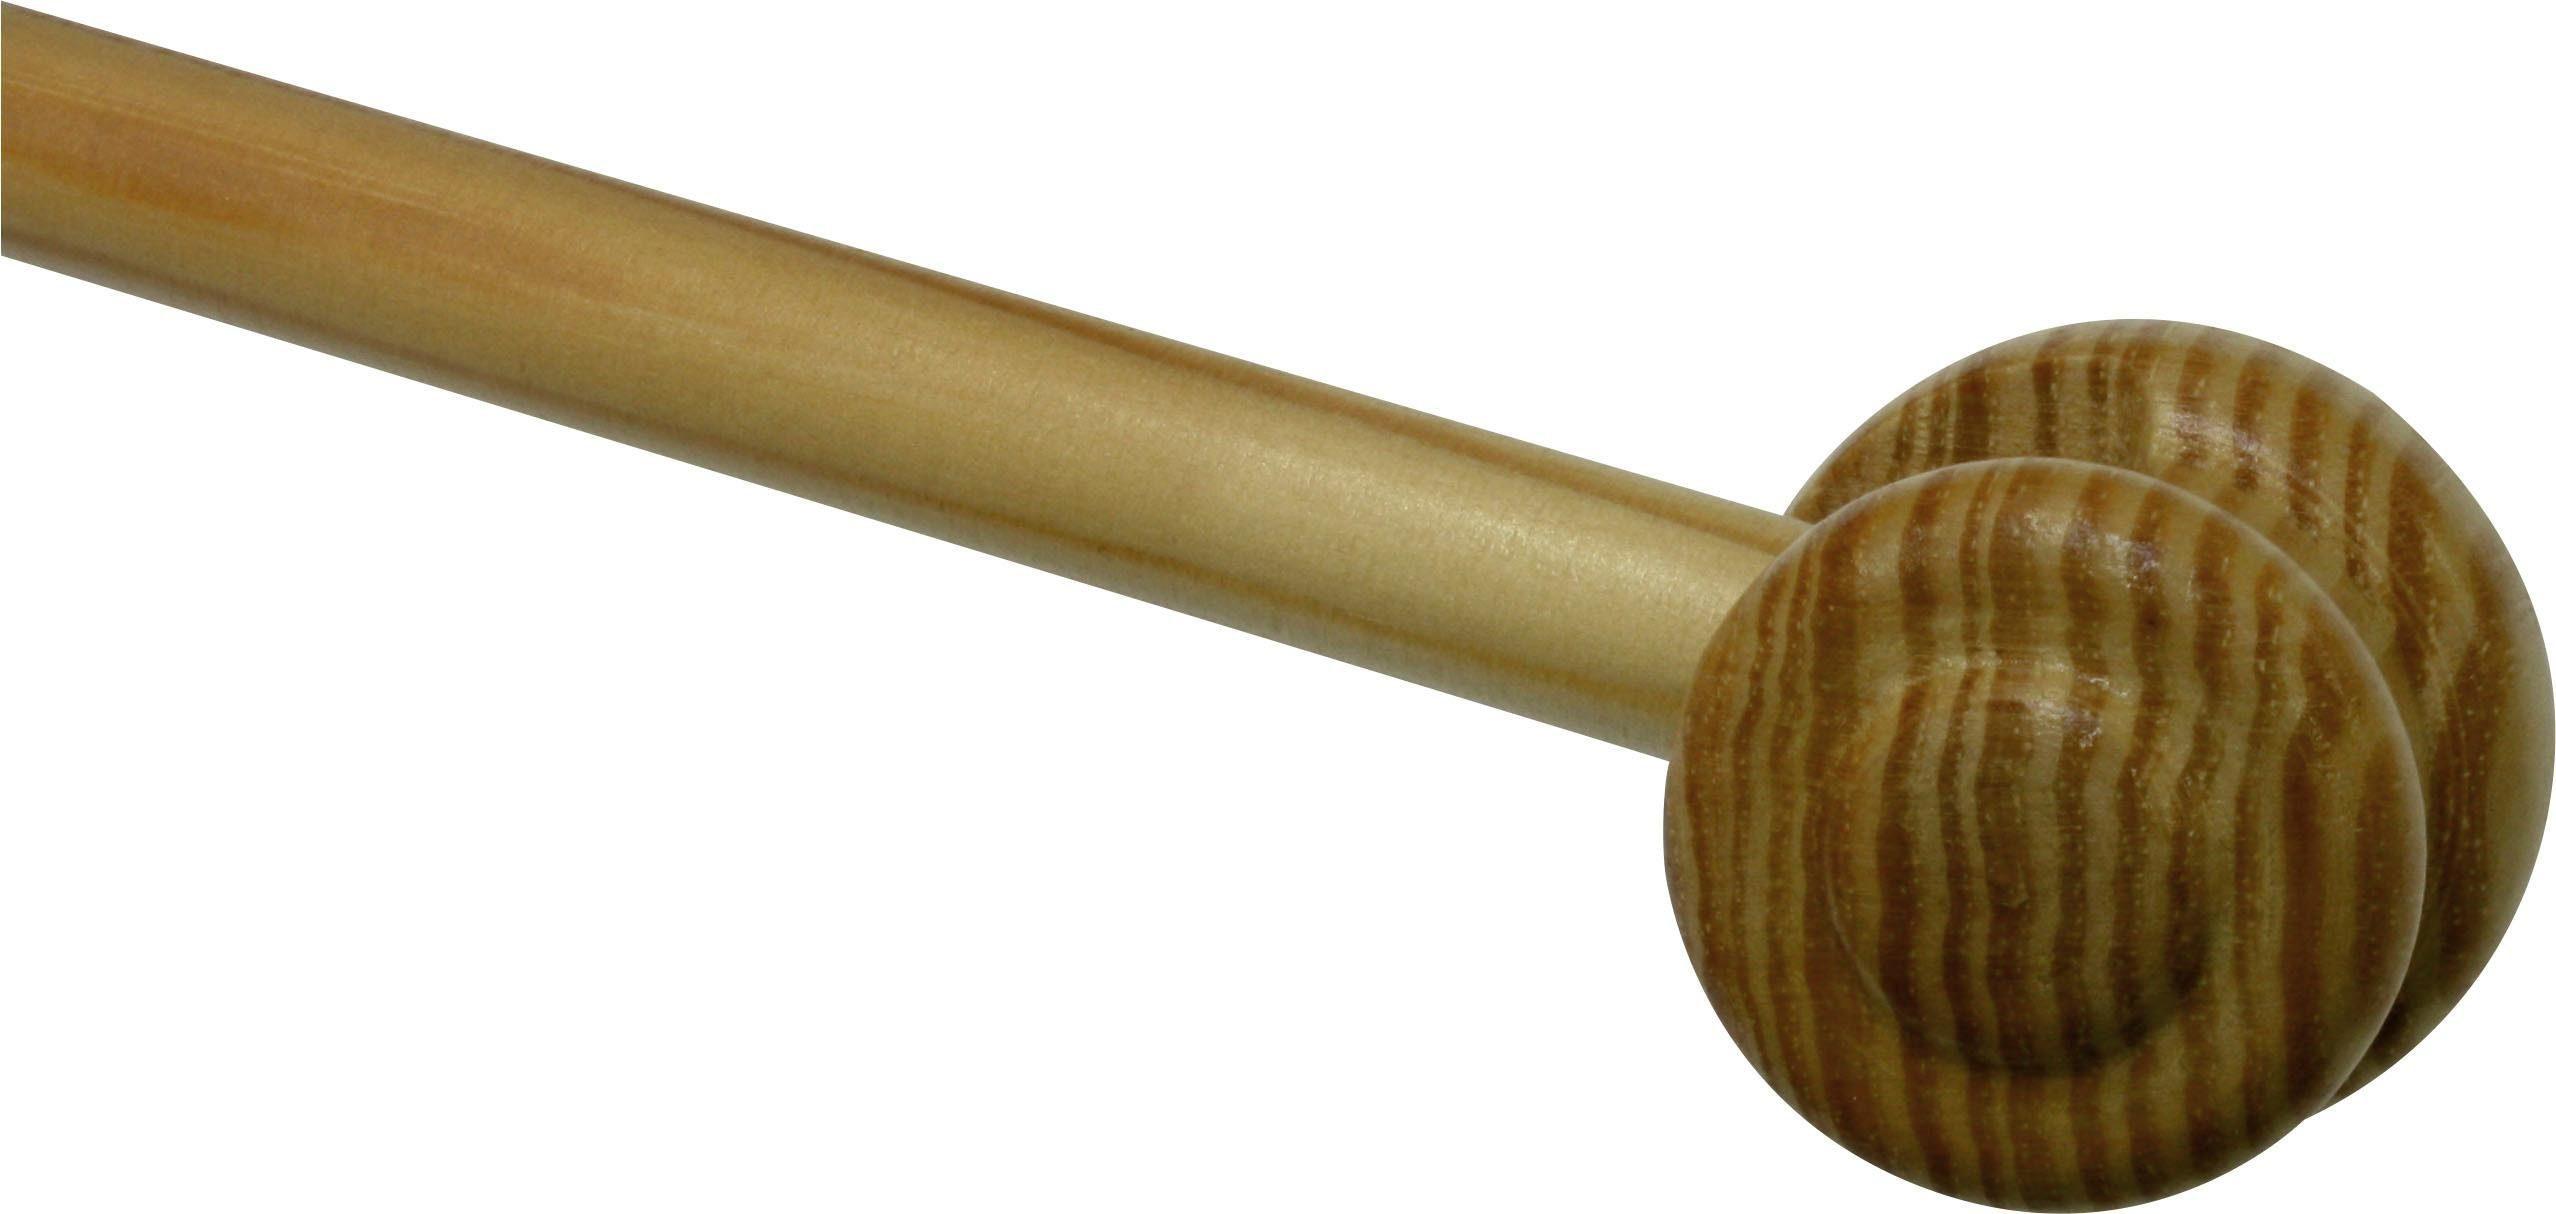 Gardinenstange, Gardinia, »Vitragestange Montana«, Ø 11 mm, 1-läufig im Fixmaß